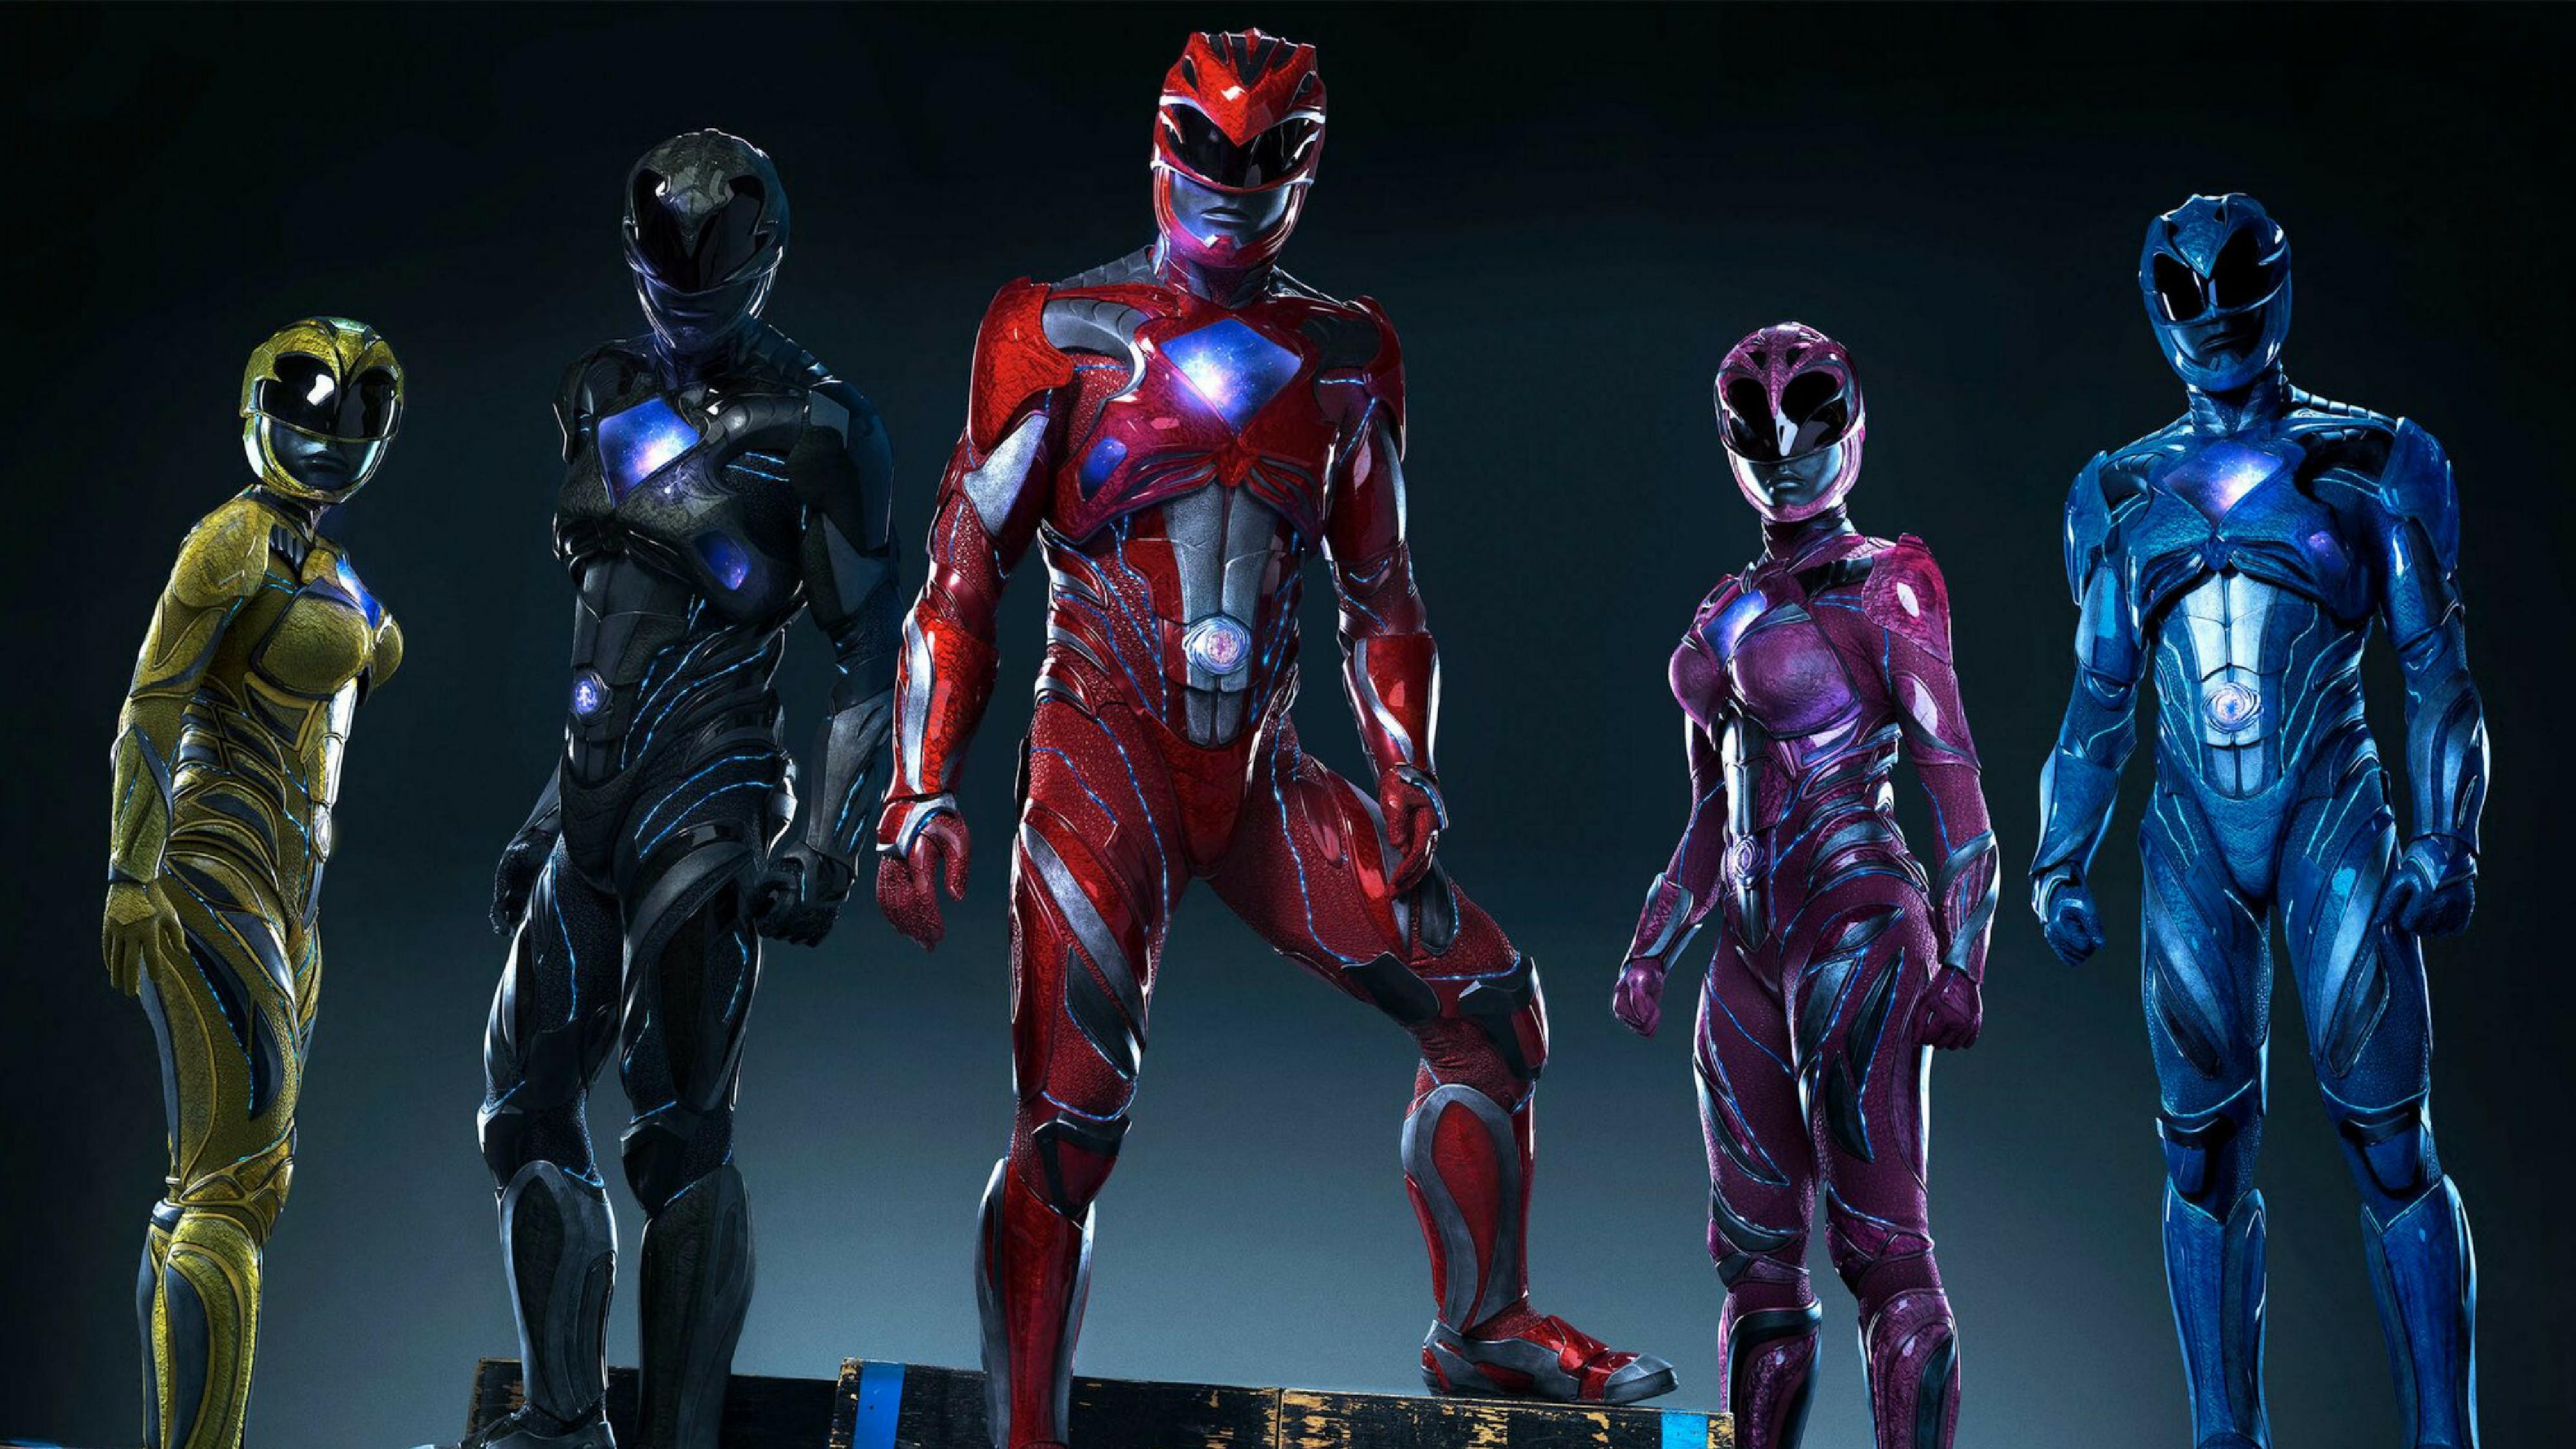 Power Rangers, it's morphin time?